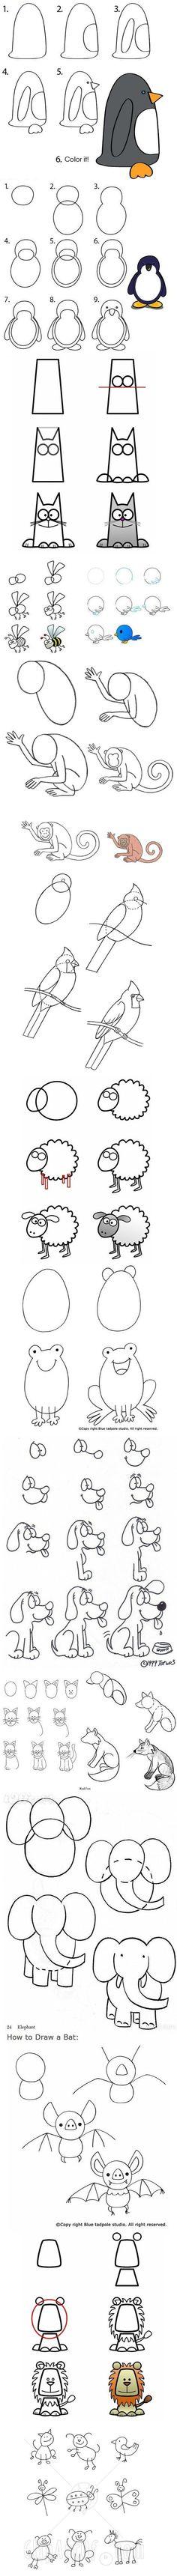 How to draw Cartoon Animals